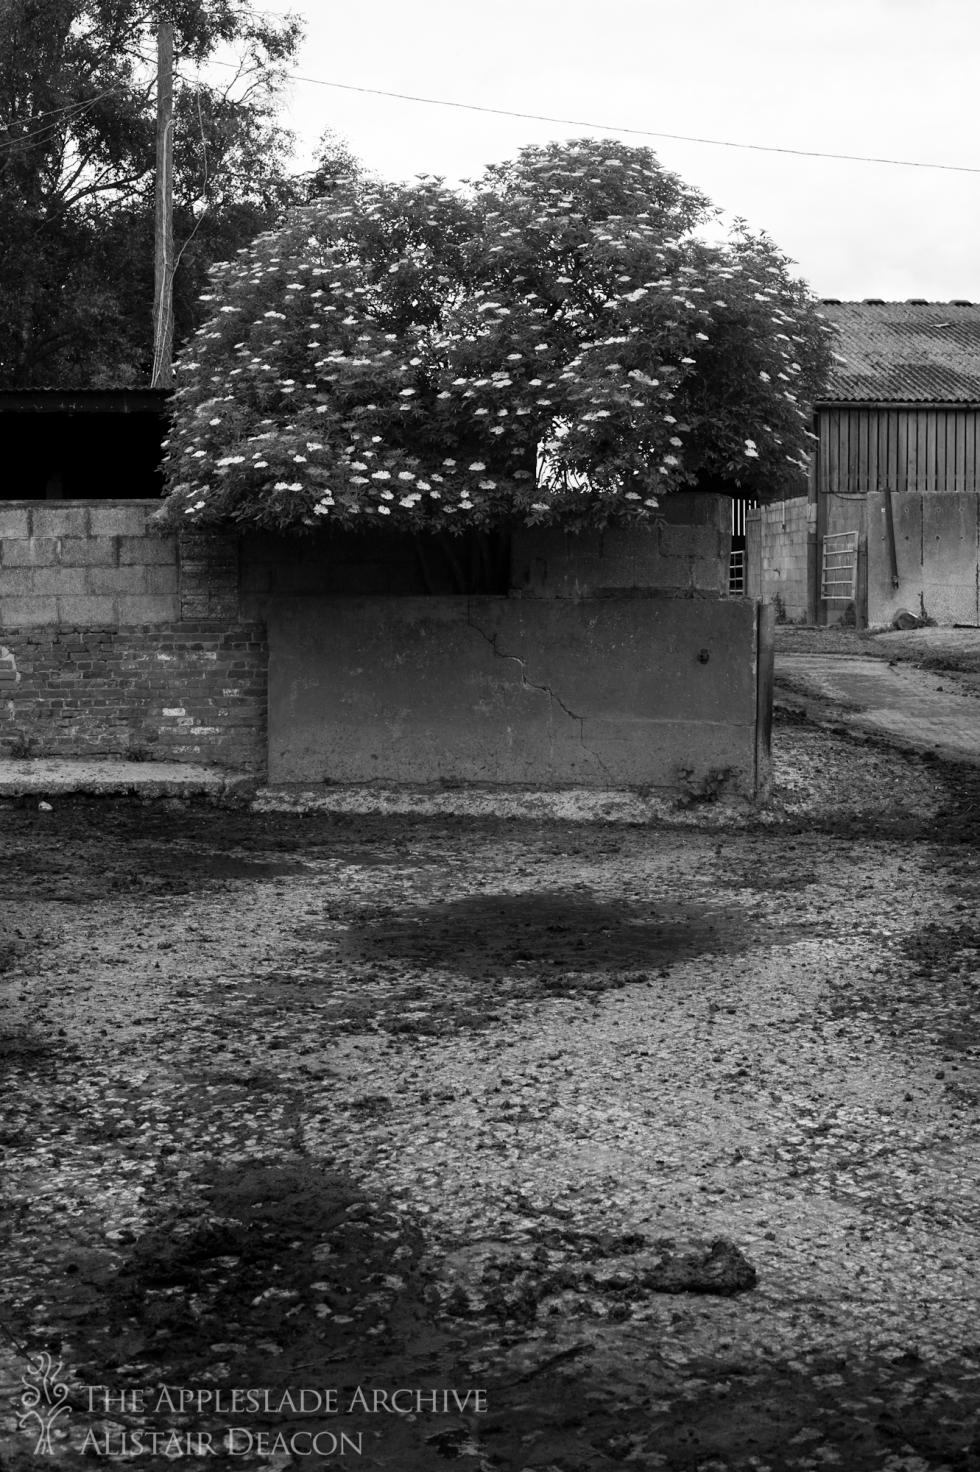 The collecting yard, Ayles Farm, Avon, Dorset, 24th June 2013